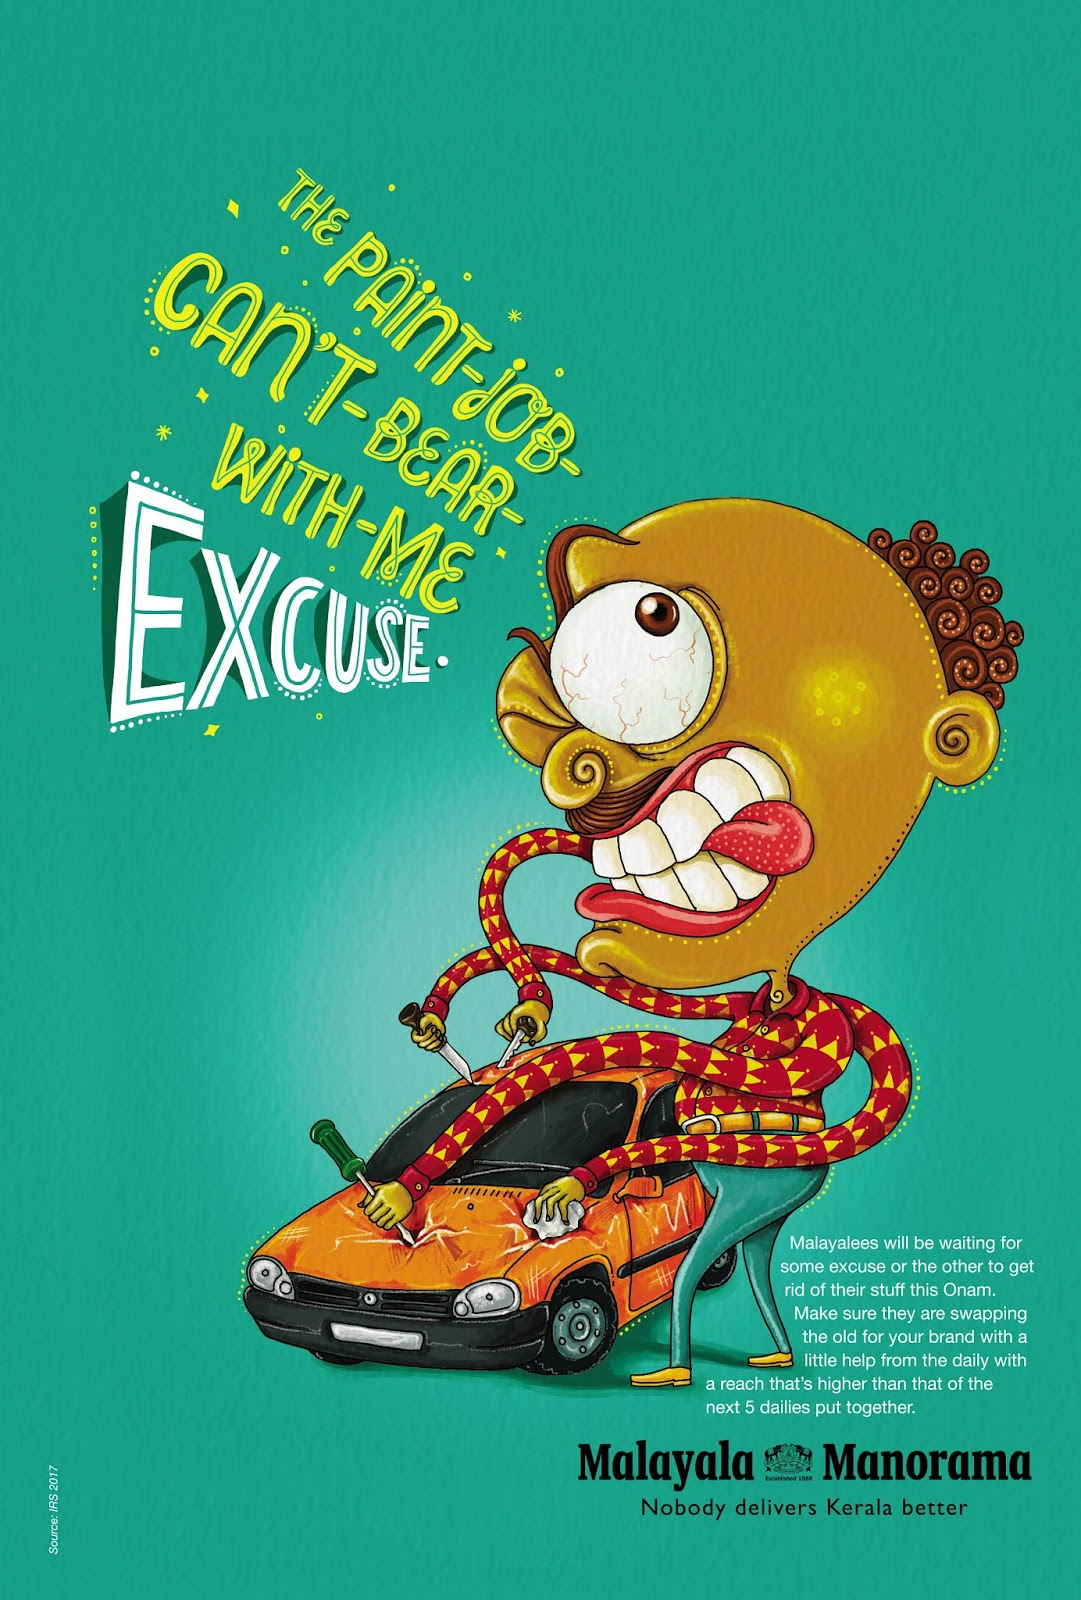 Malayala Manorama | The Season of Excuses 2 | Stark Communications Pvt Ltd